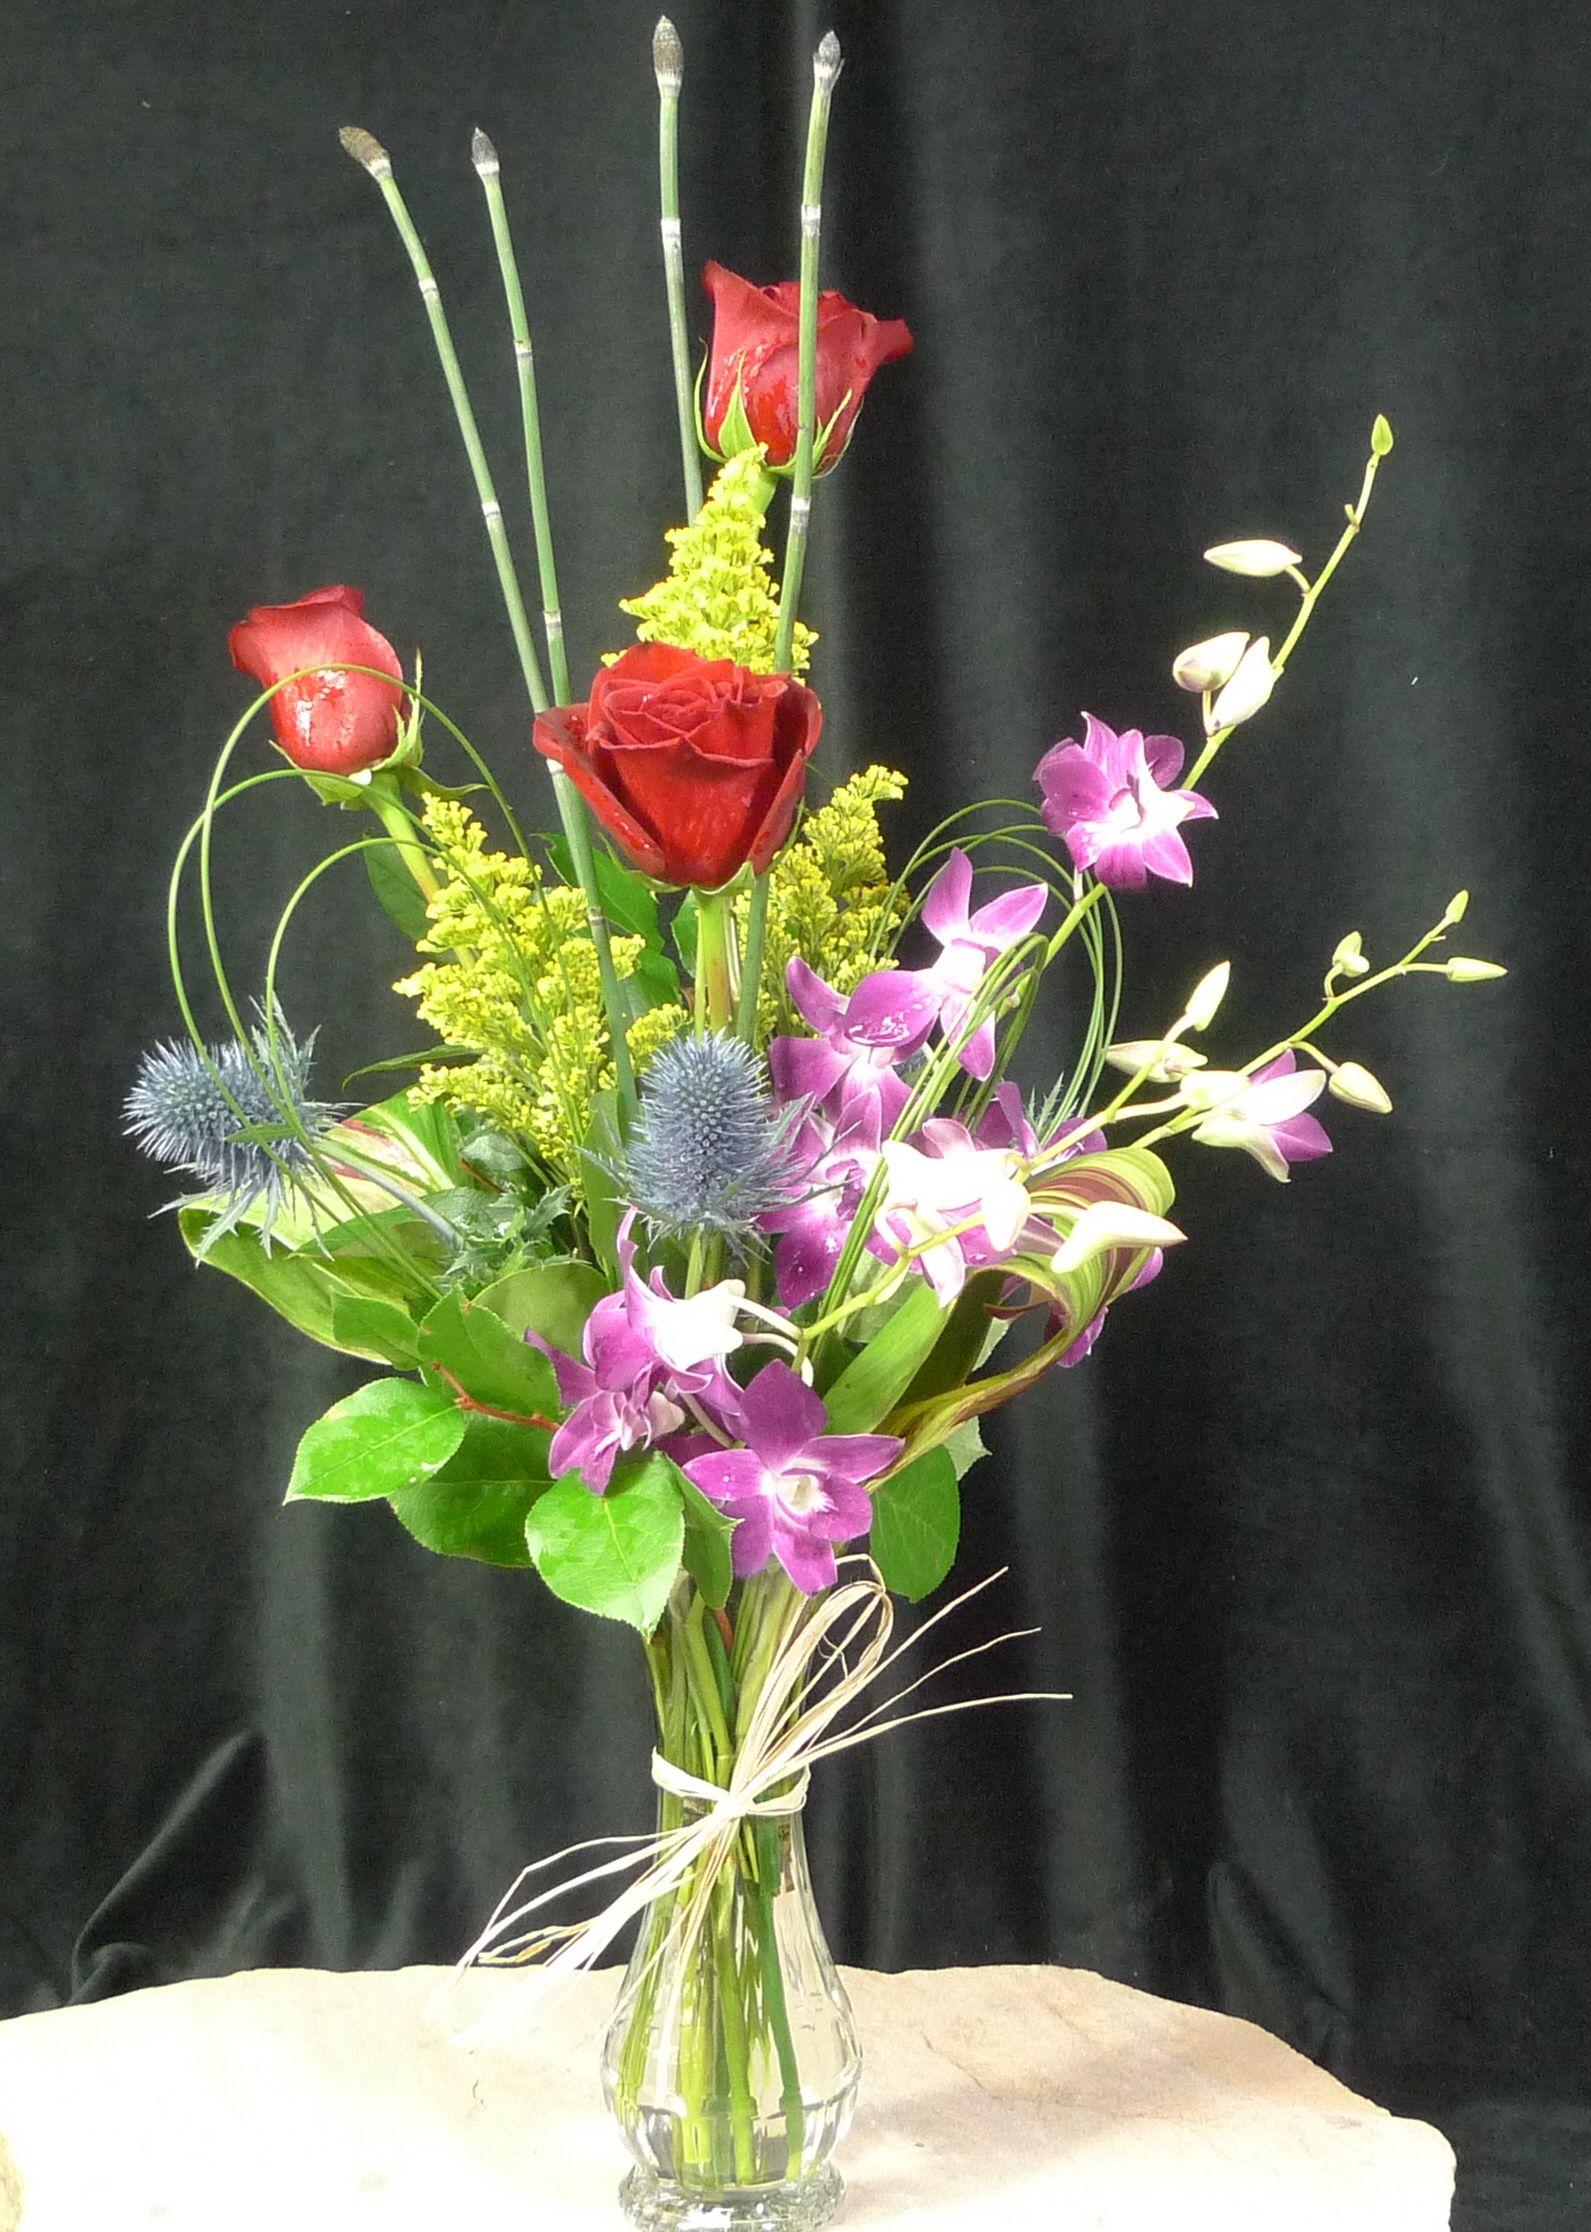 First lady flowers delivered flower arrangements